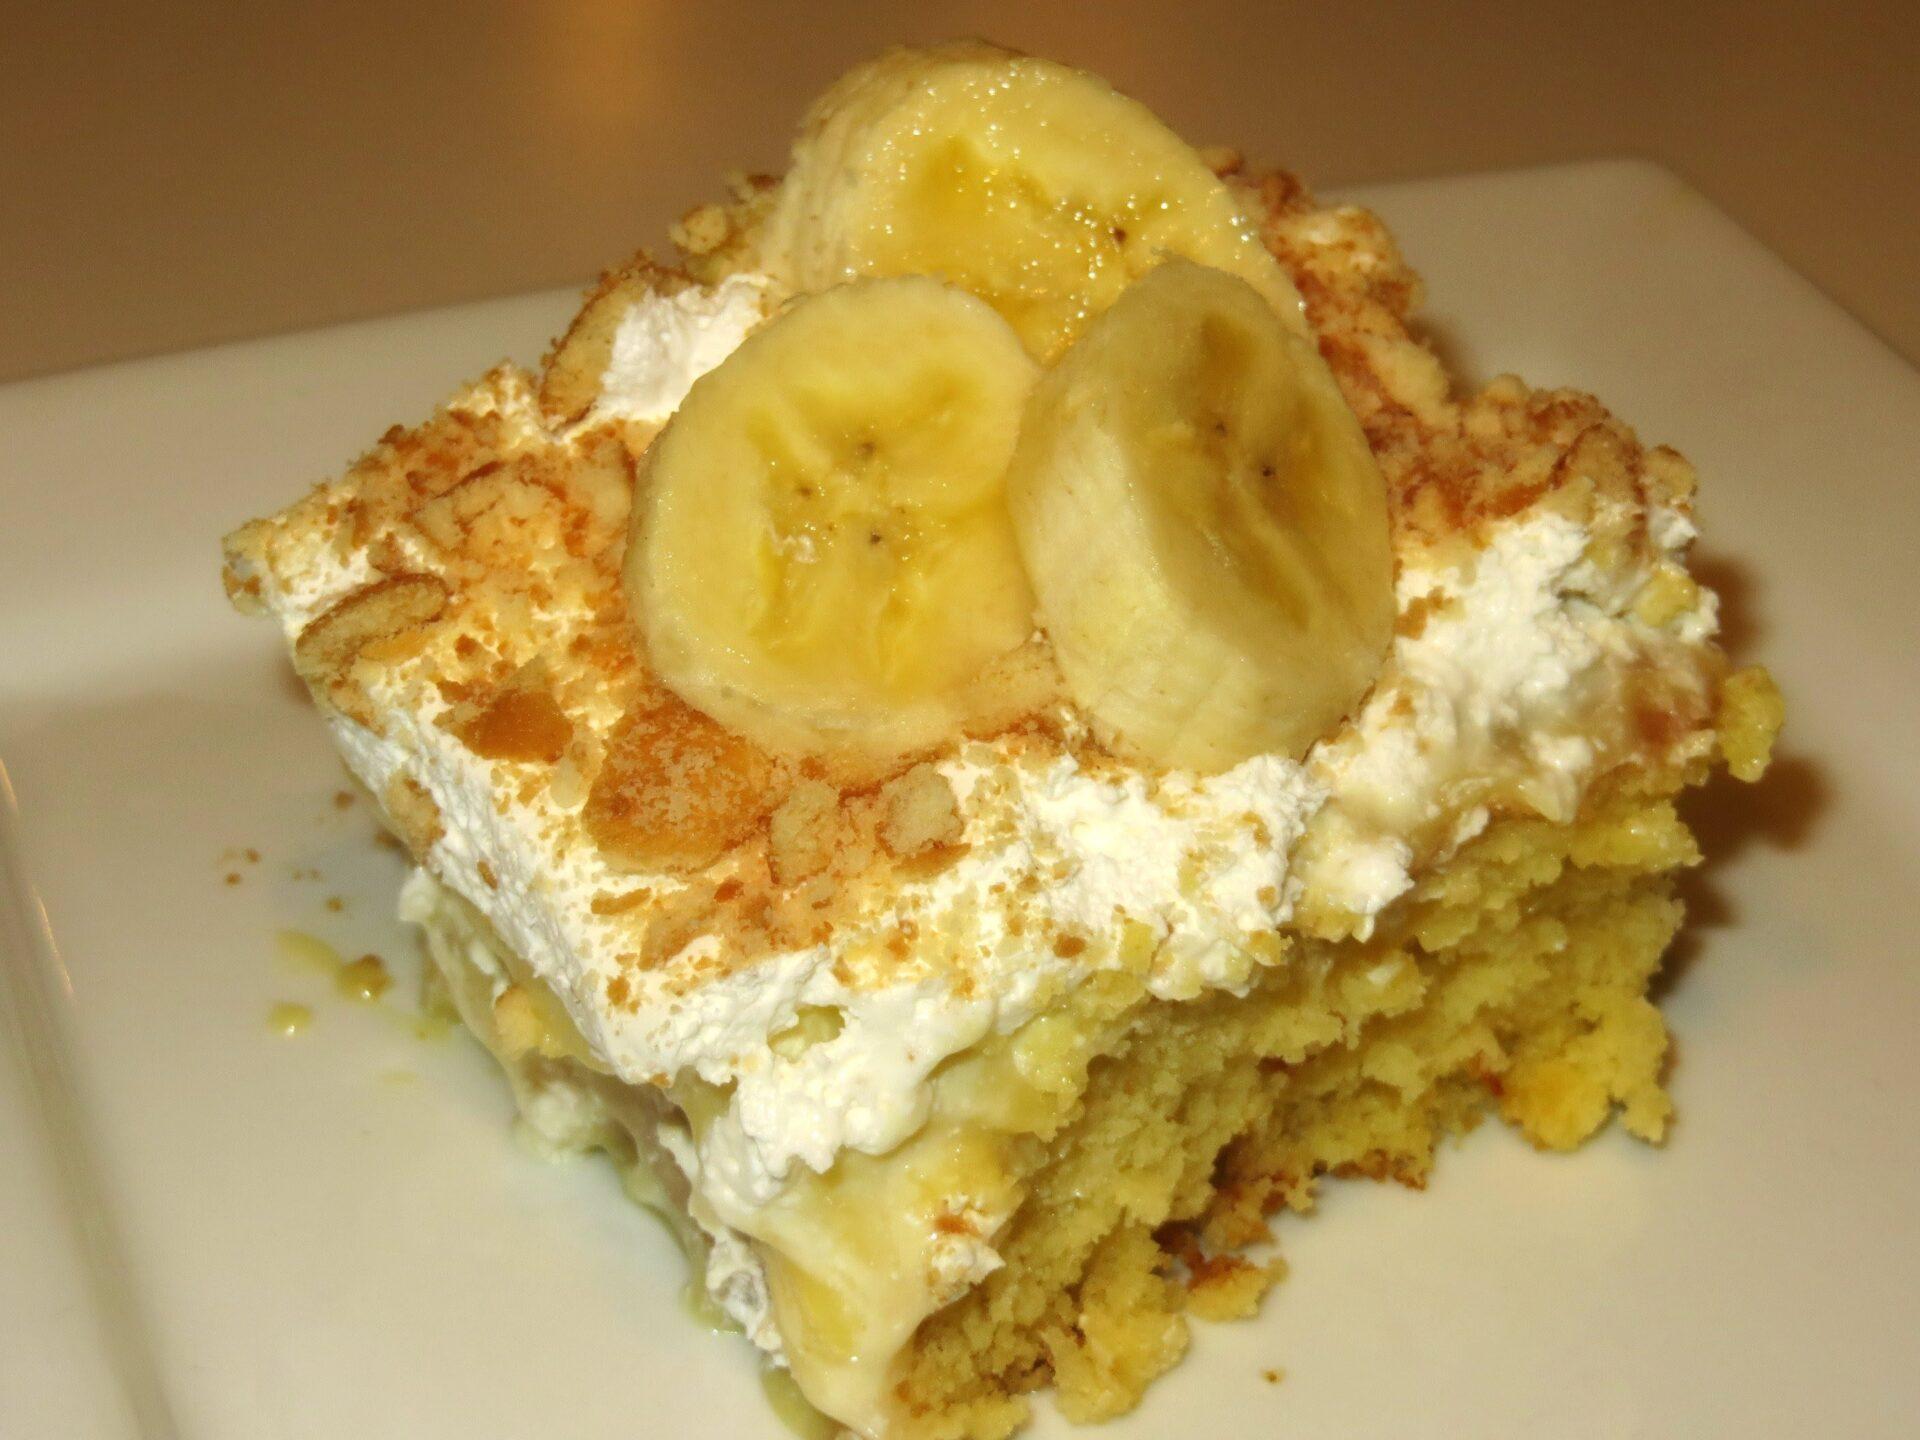 A Yummy Banana Pudding Poke Cake To Make